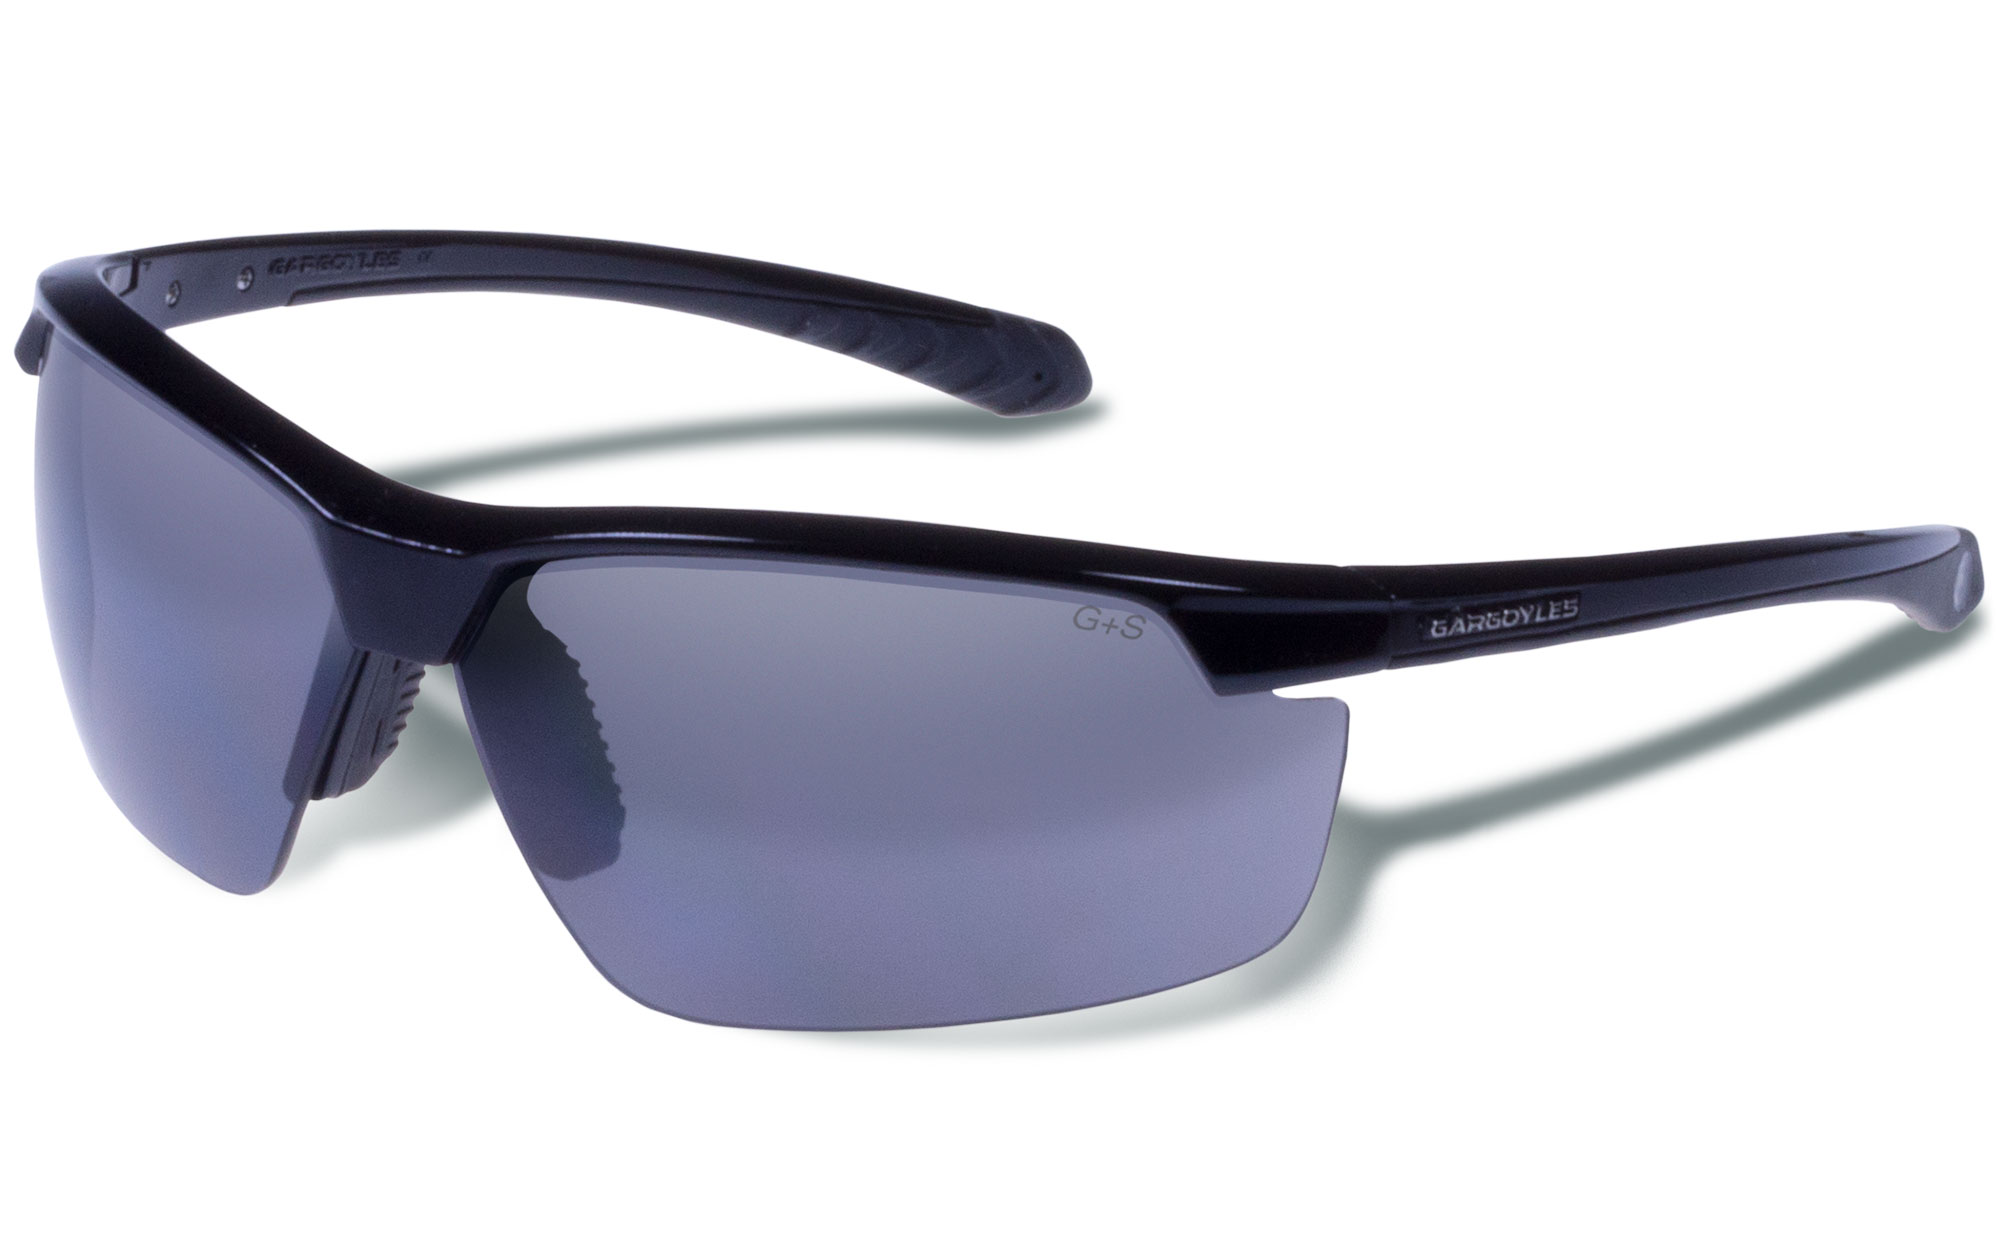 9e960b209c3 Gargoyles Stakeout Sunglasses FREE S H 10700114.QTM